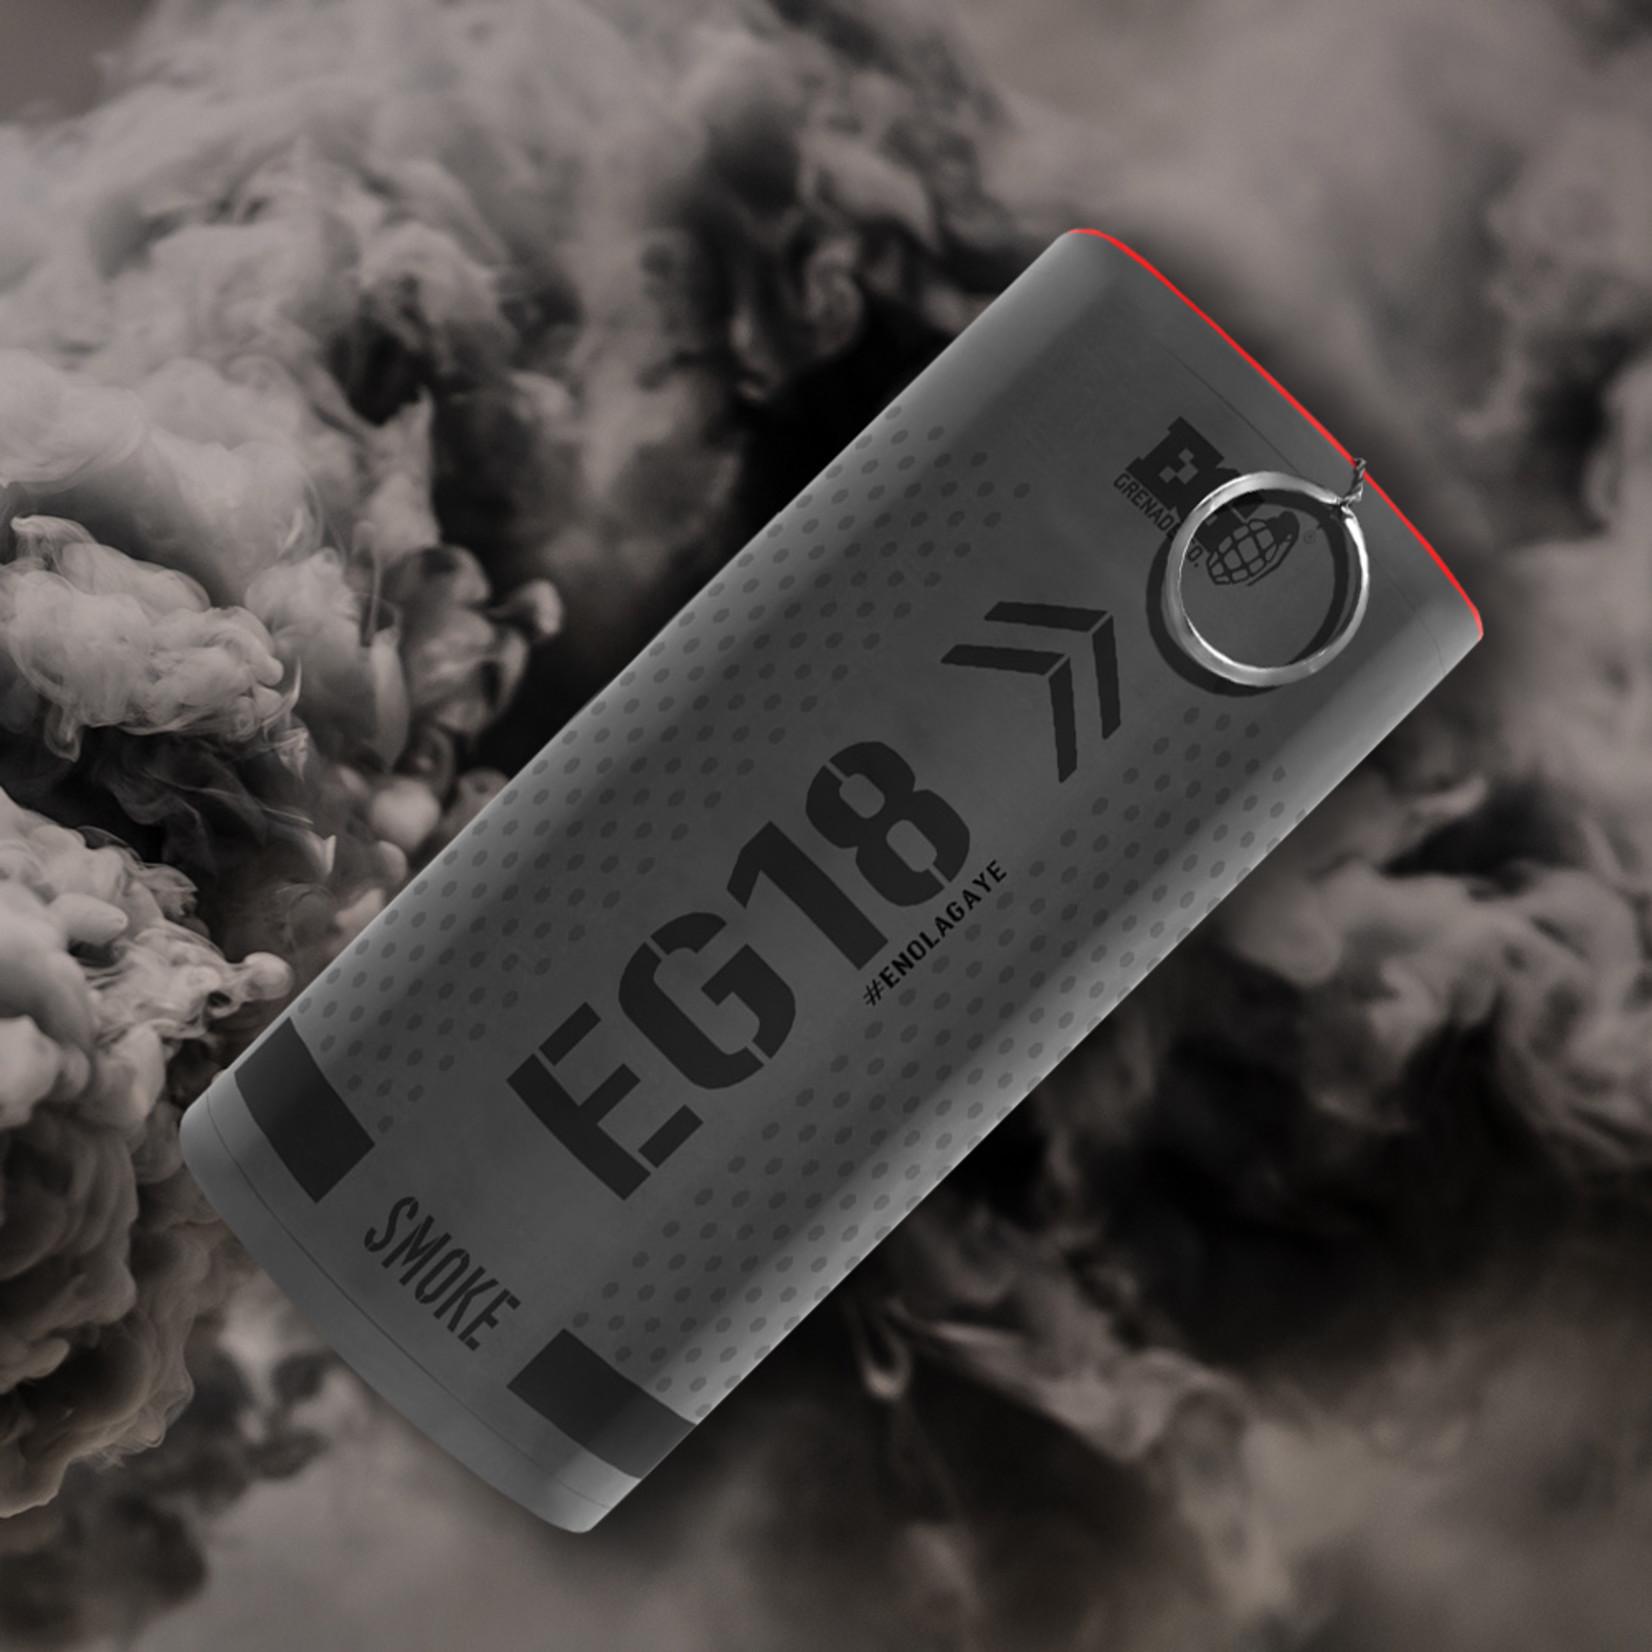 EG18 - Black Smoke Grenade